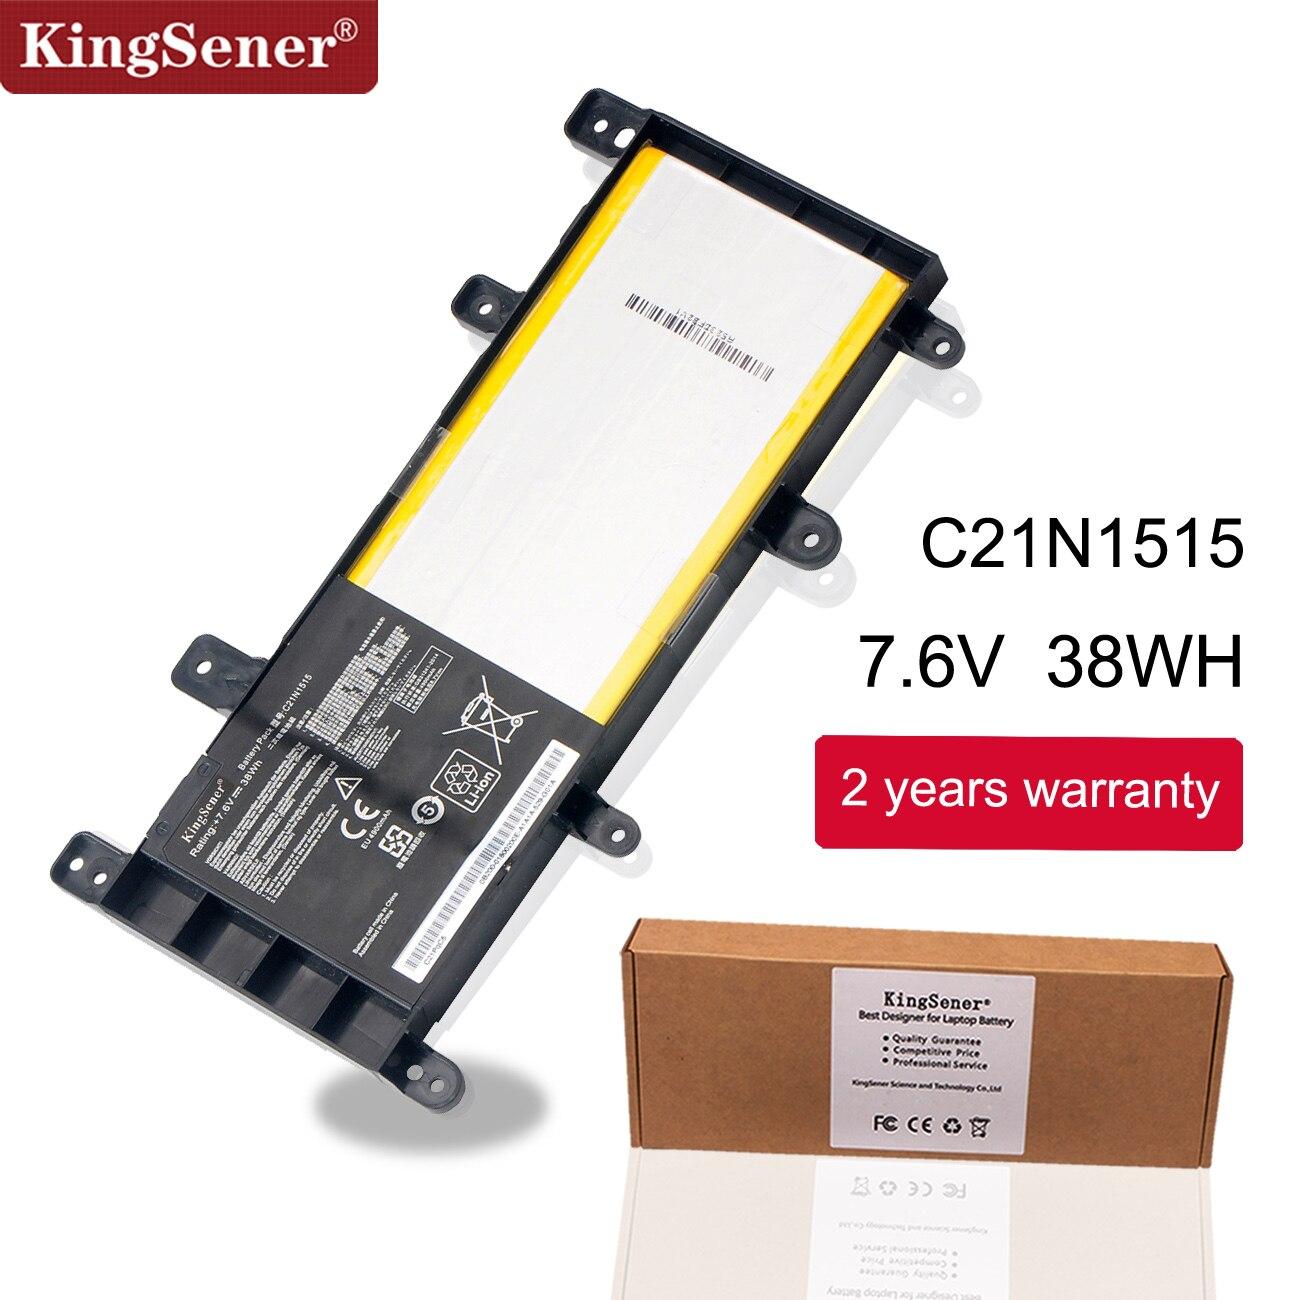 KingSener C21N1515 batería del ordenador portátil para ASUS VivoBook X756 X756UA X756UJ X756UX X756UB X756UQ X756UV X756UW 7,6 V 38WH